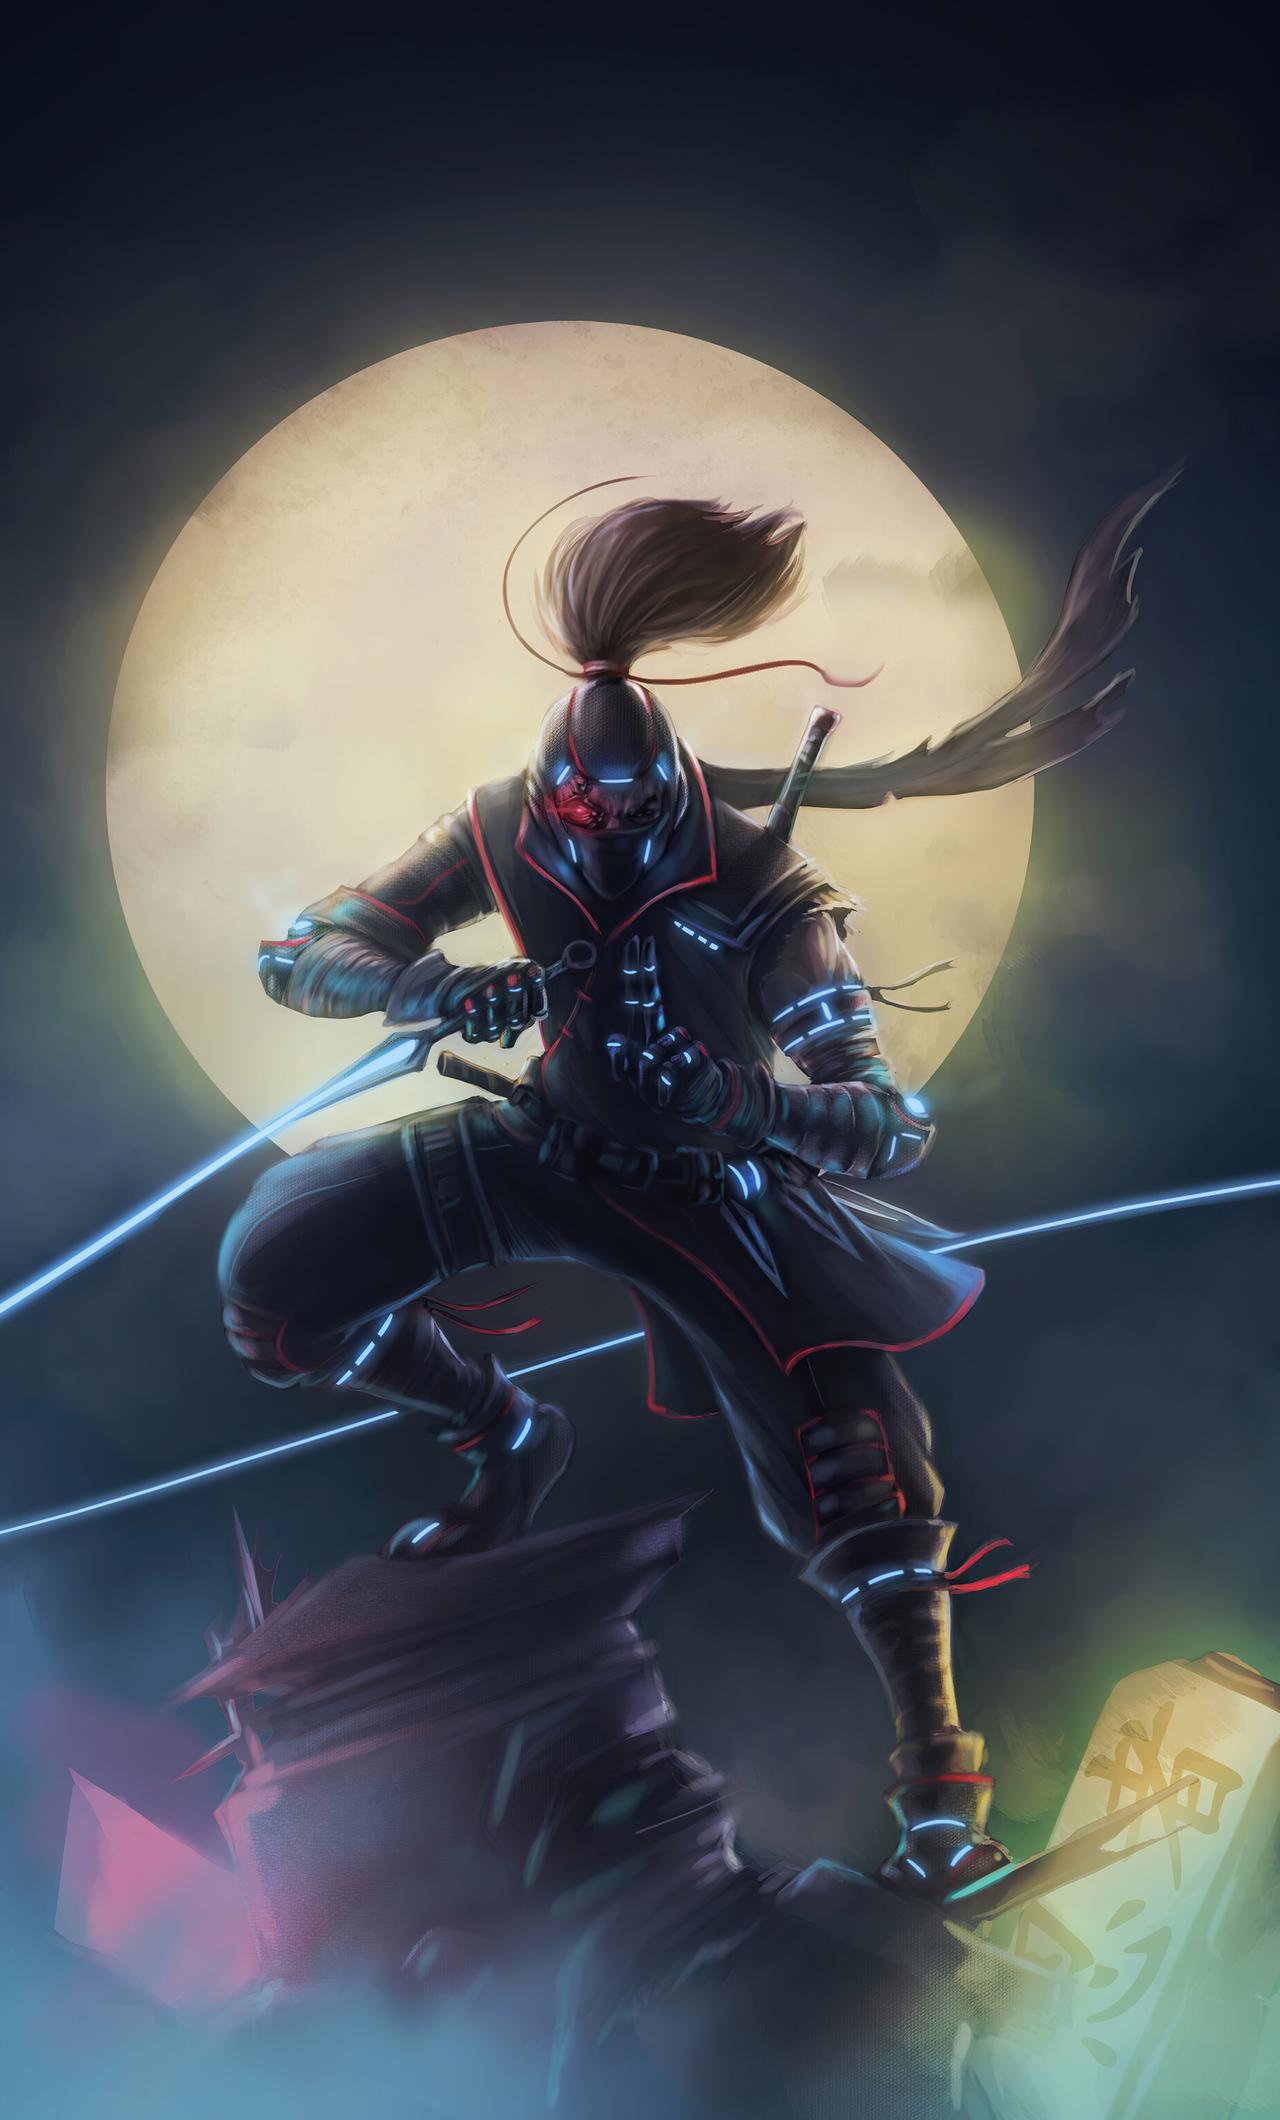 1280x2120 Cyberpunk Ninja Super Move 4k iPhone 6+ HD 4k ...